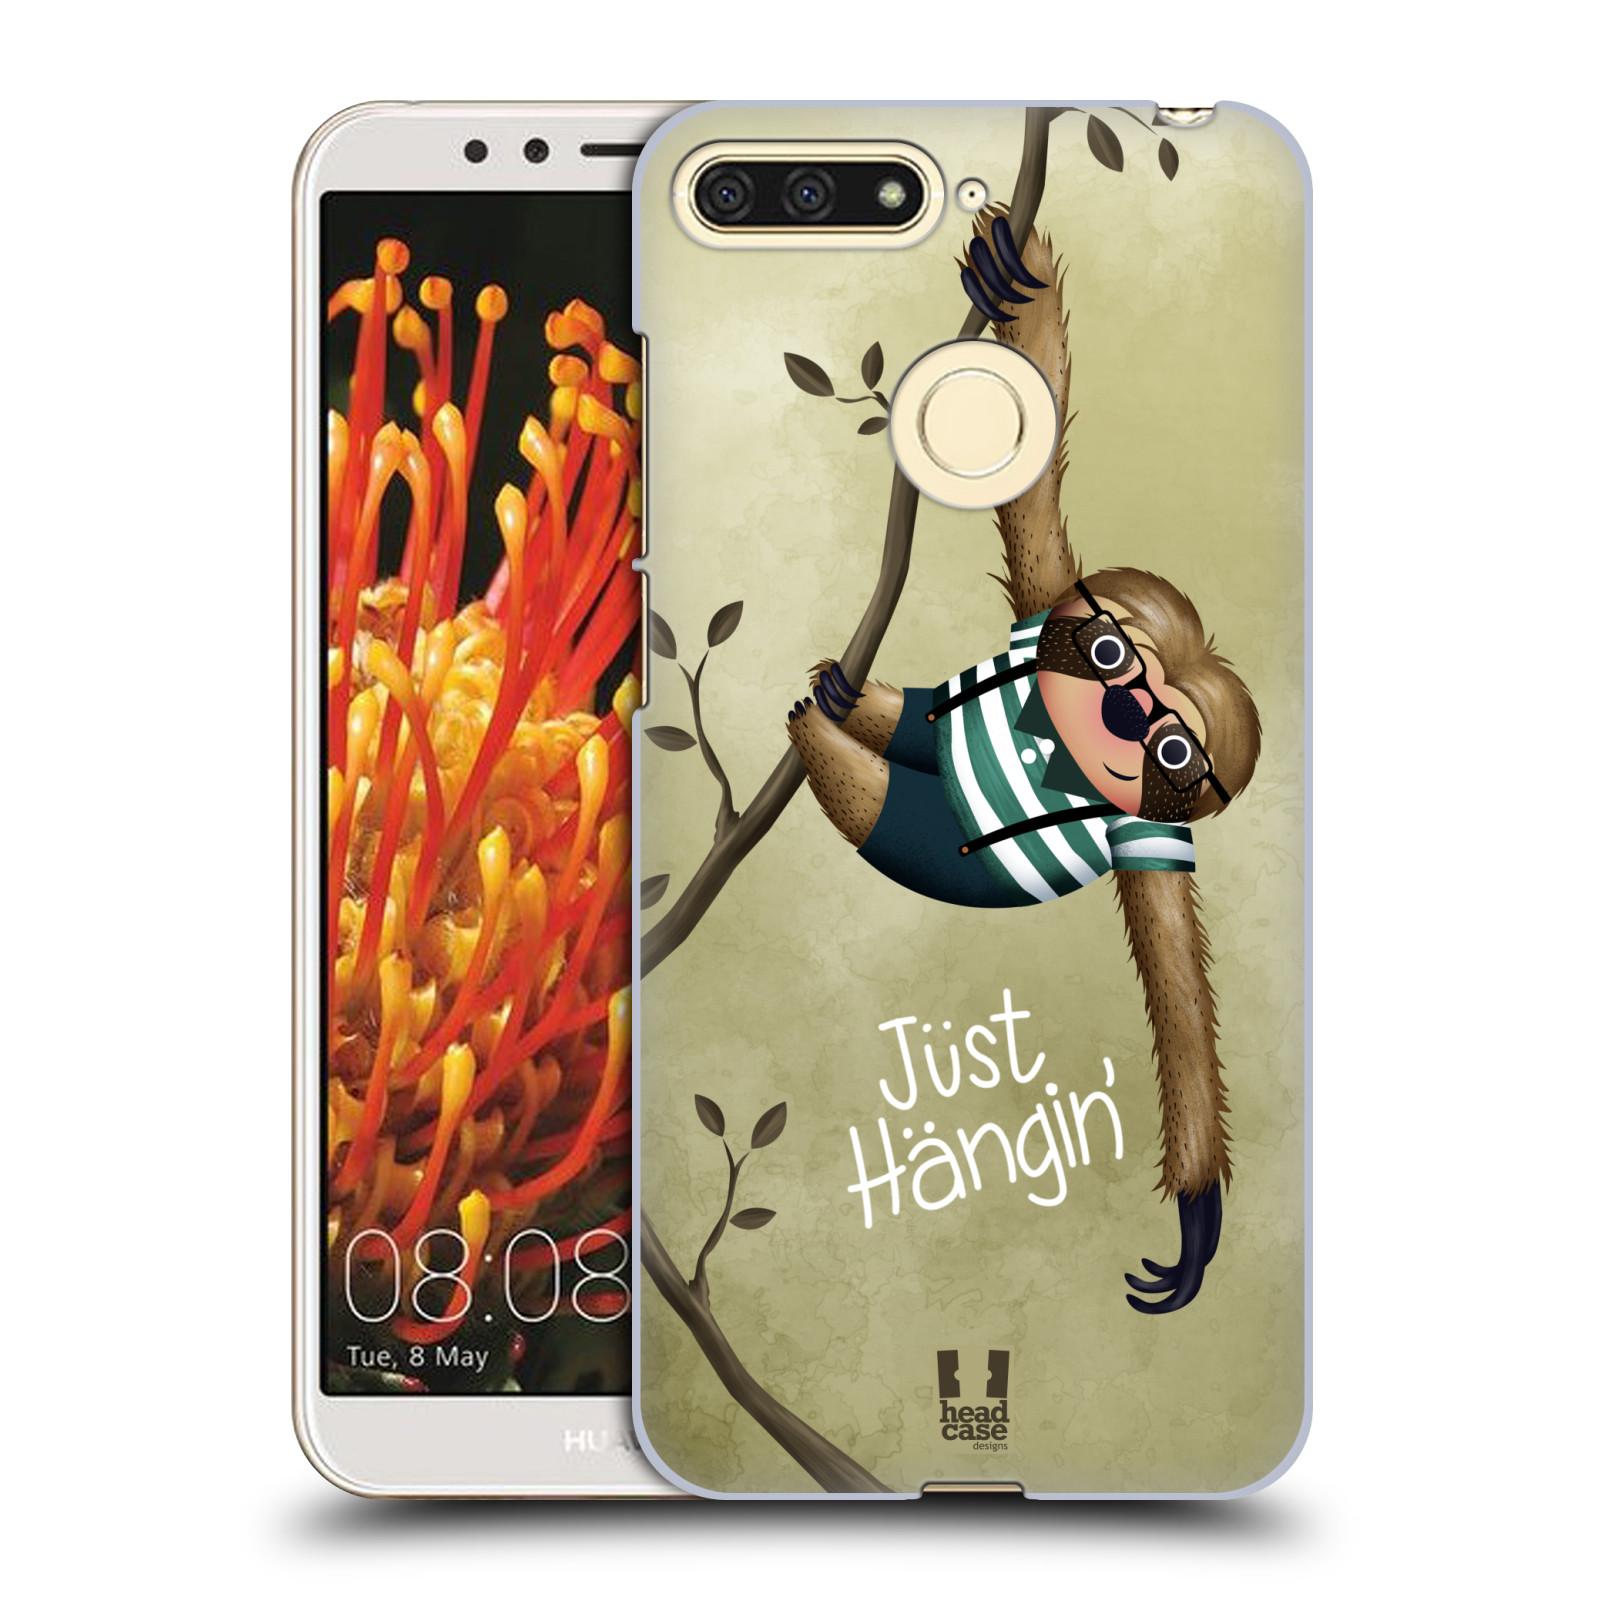 Plastové pouzdro na mobil Huawei Y6 Prime 2018 - Head Case - Lenochod Just Hangin